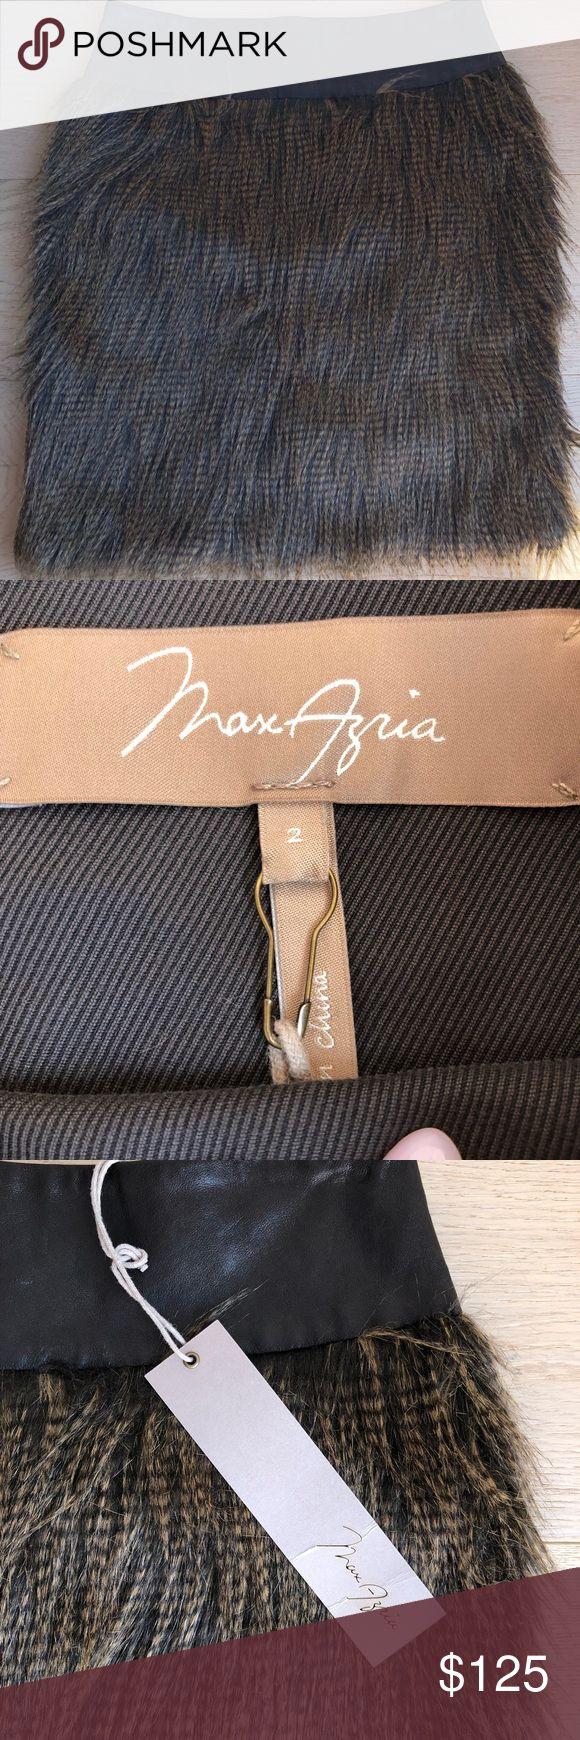 Max Azria skirt Max Azria skirt. Brand new never worn. Has tag shown above. Perfect for fall 🍁🍂 BCBGMaxAzria Skirts Midi